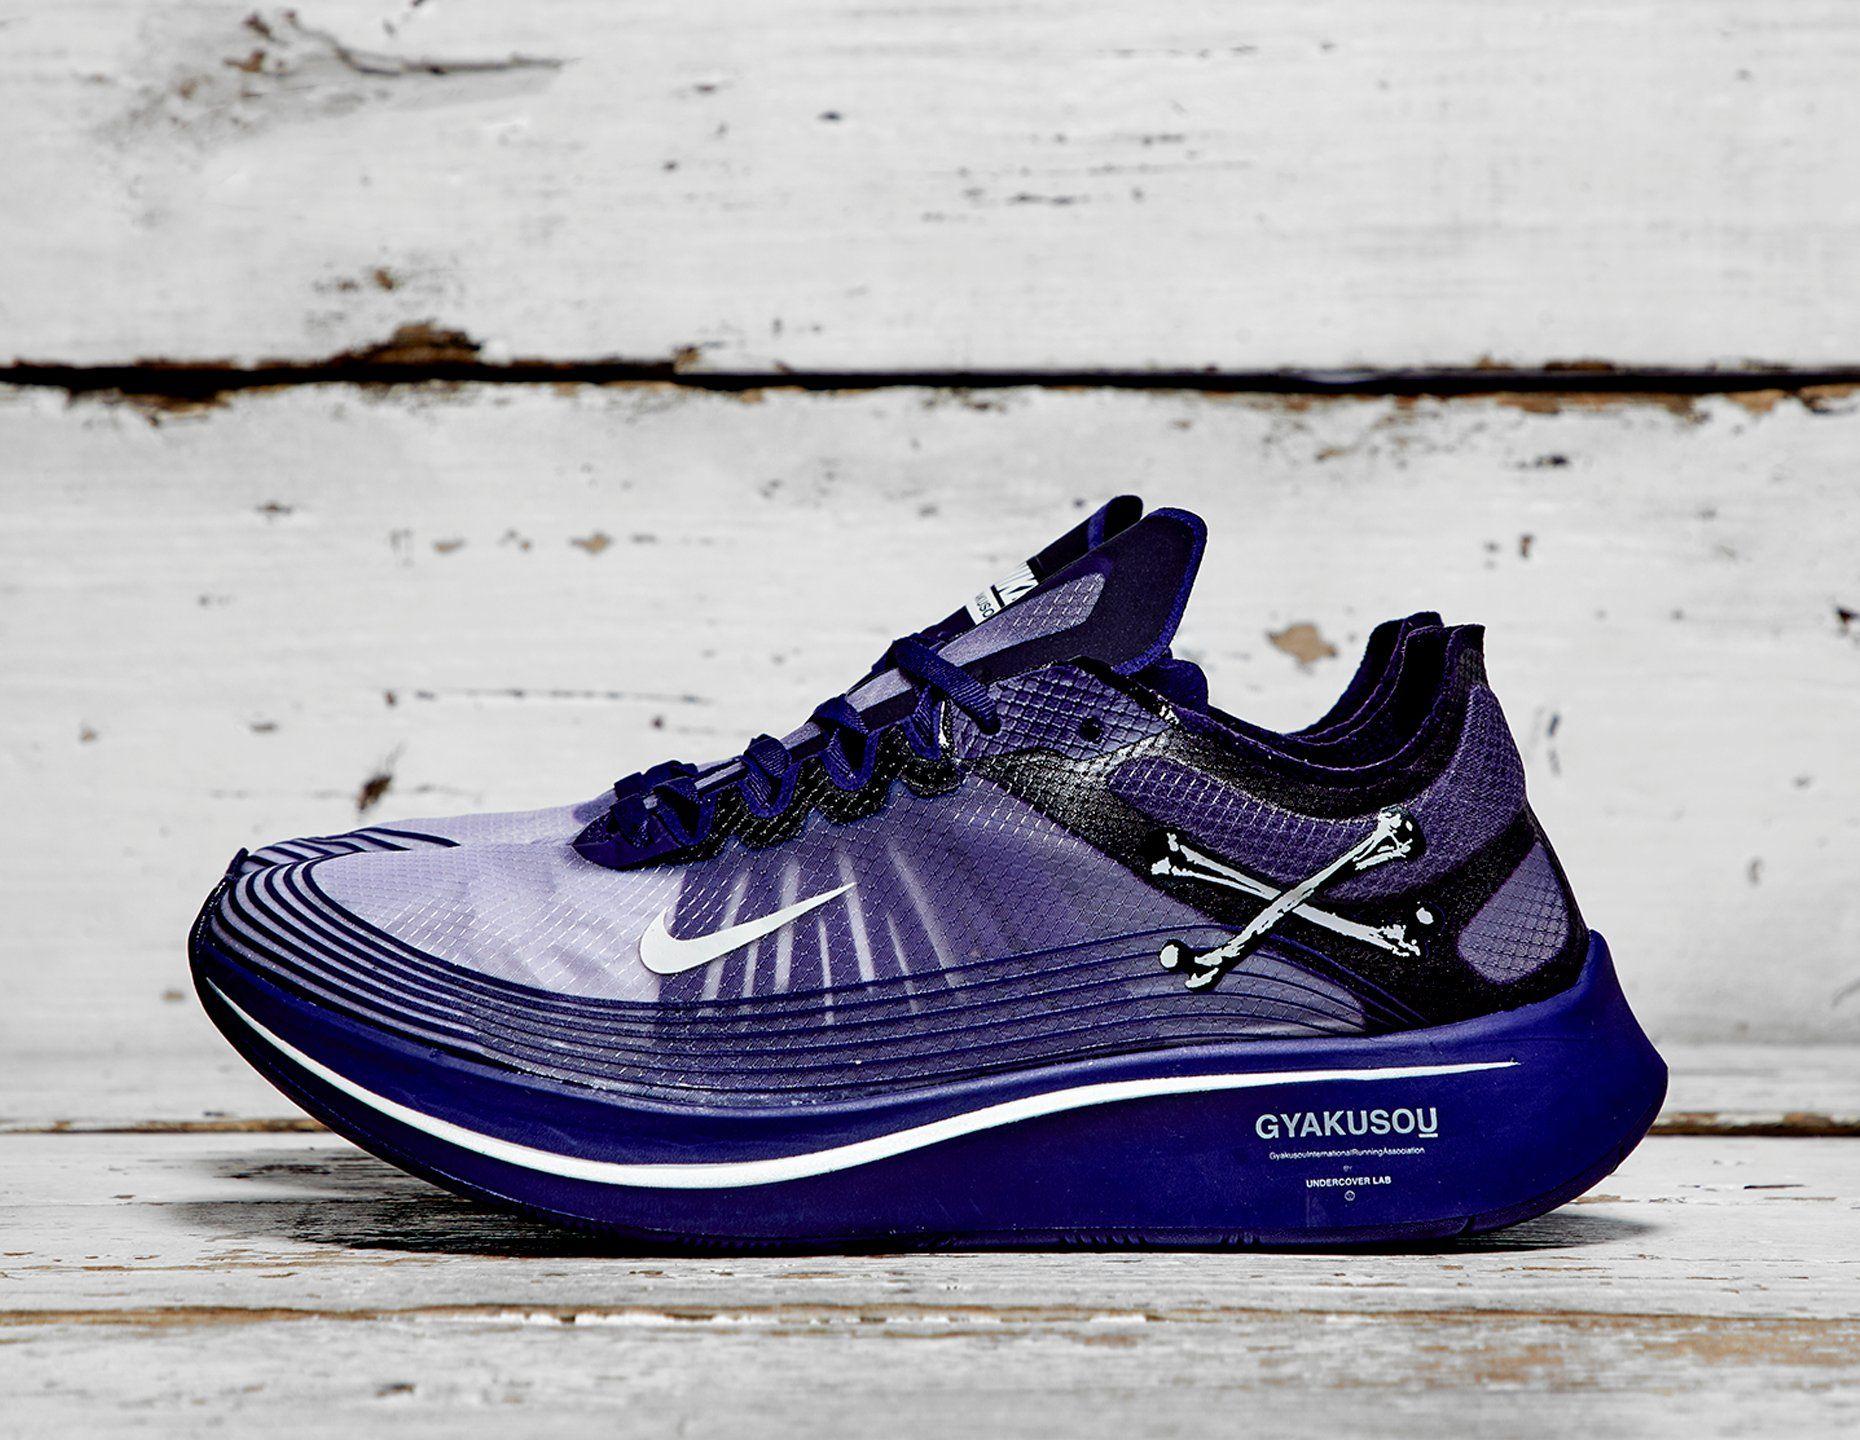 a6d623d56106 NikeLab x Gyakusou Zoom Fly SP